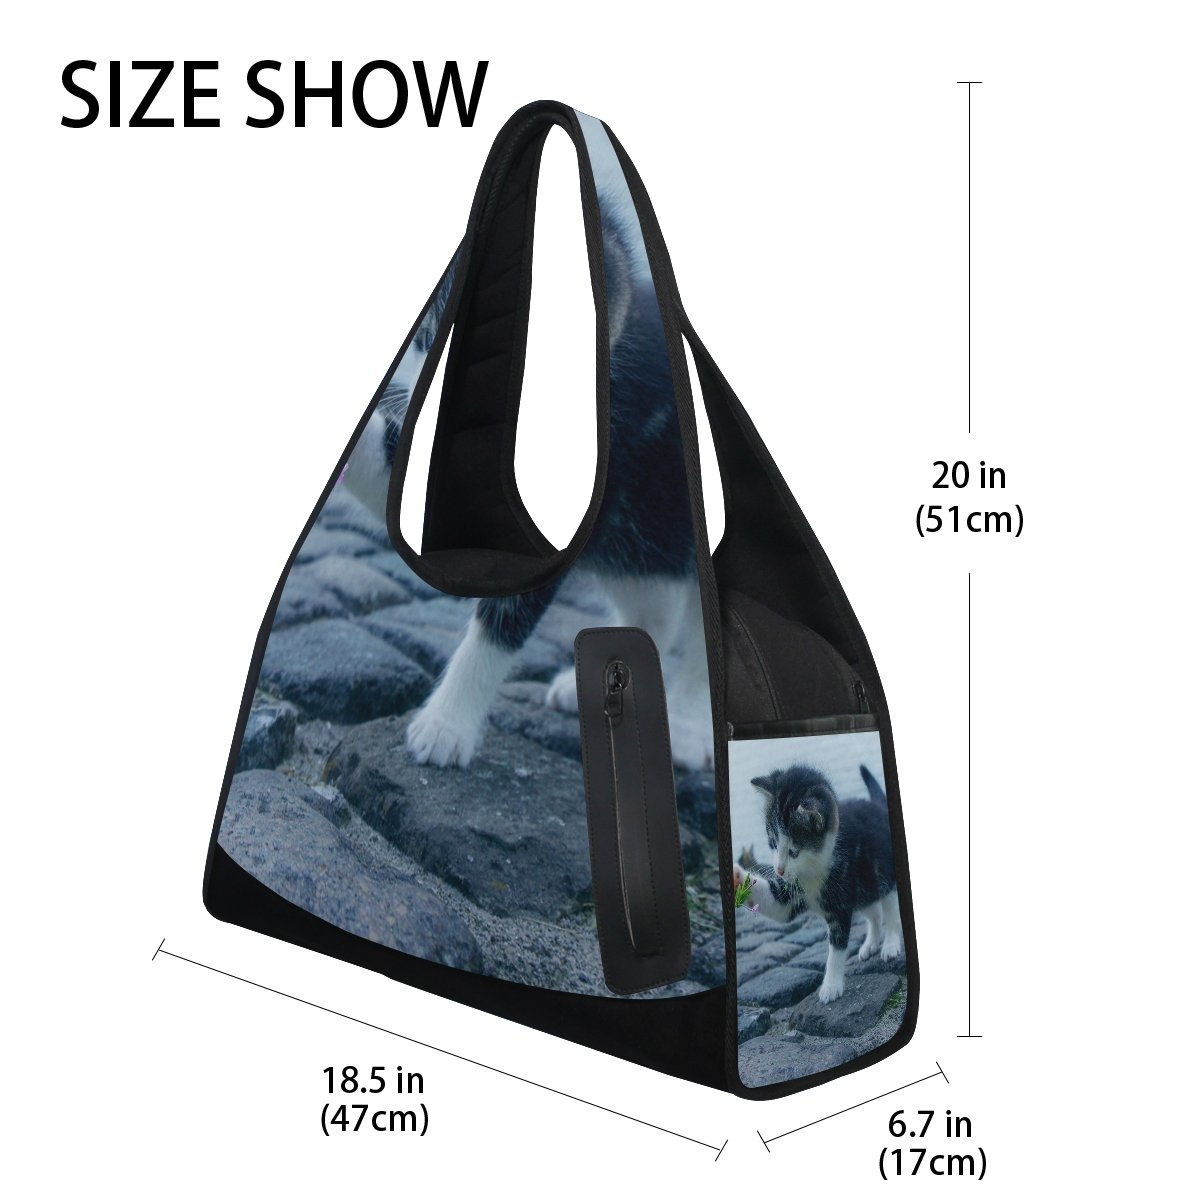 AHOMY Sports Gym Bag Stone Flower Cat Duffel Bag Travel Shoulder Bag